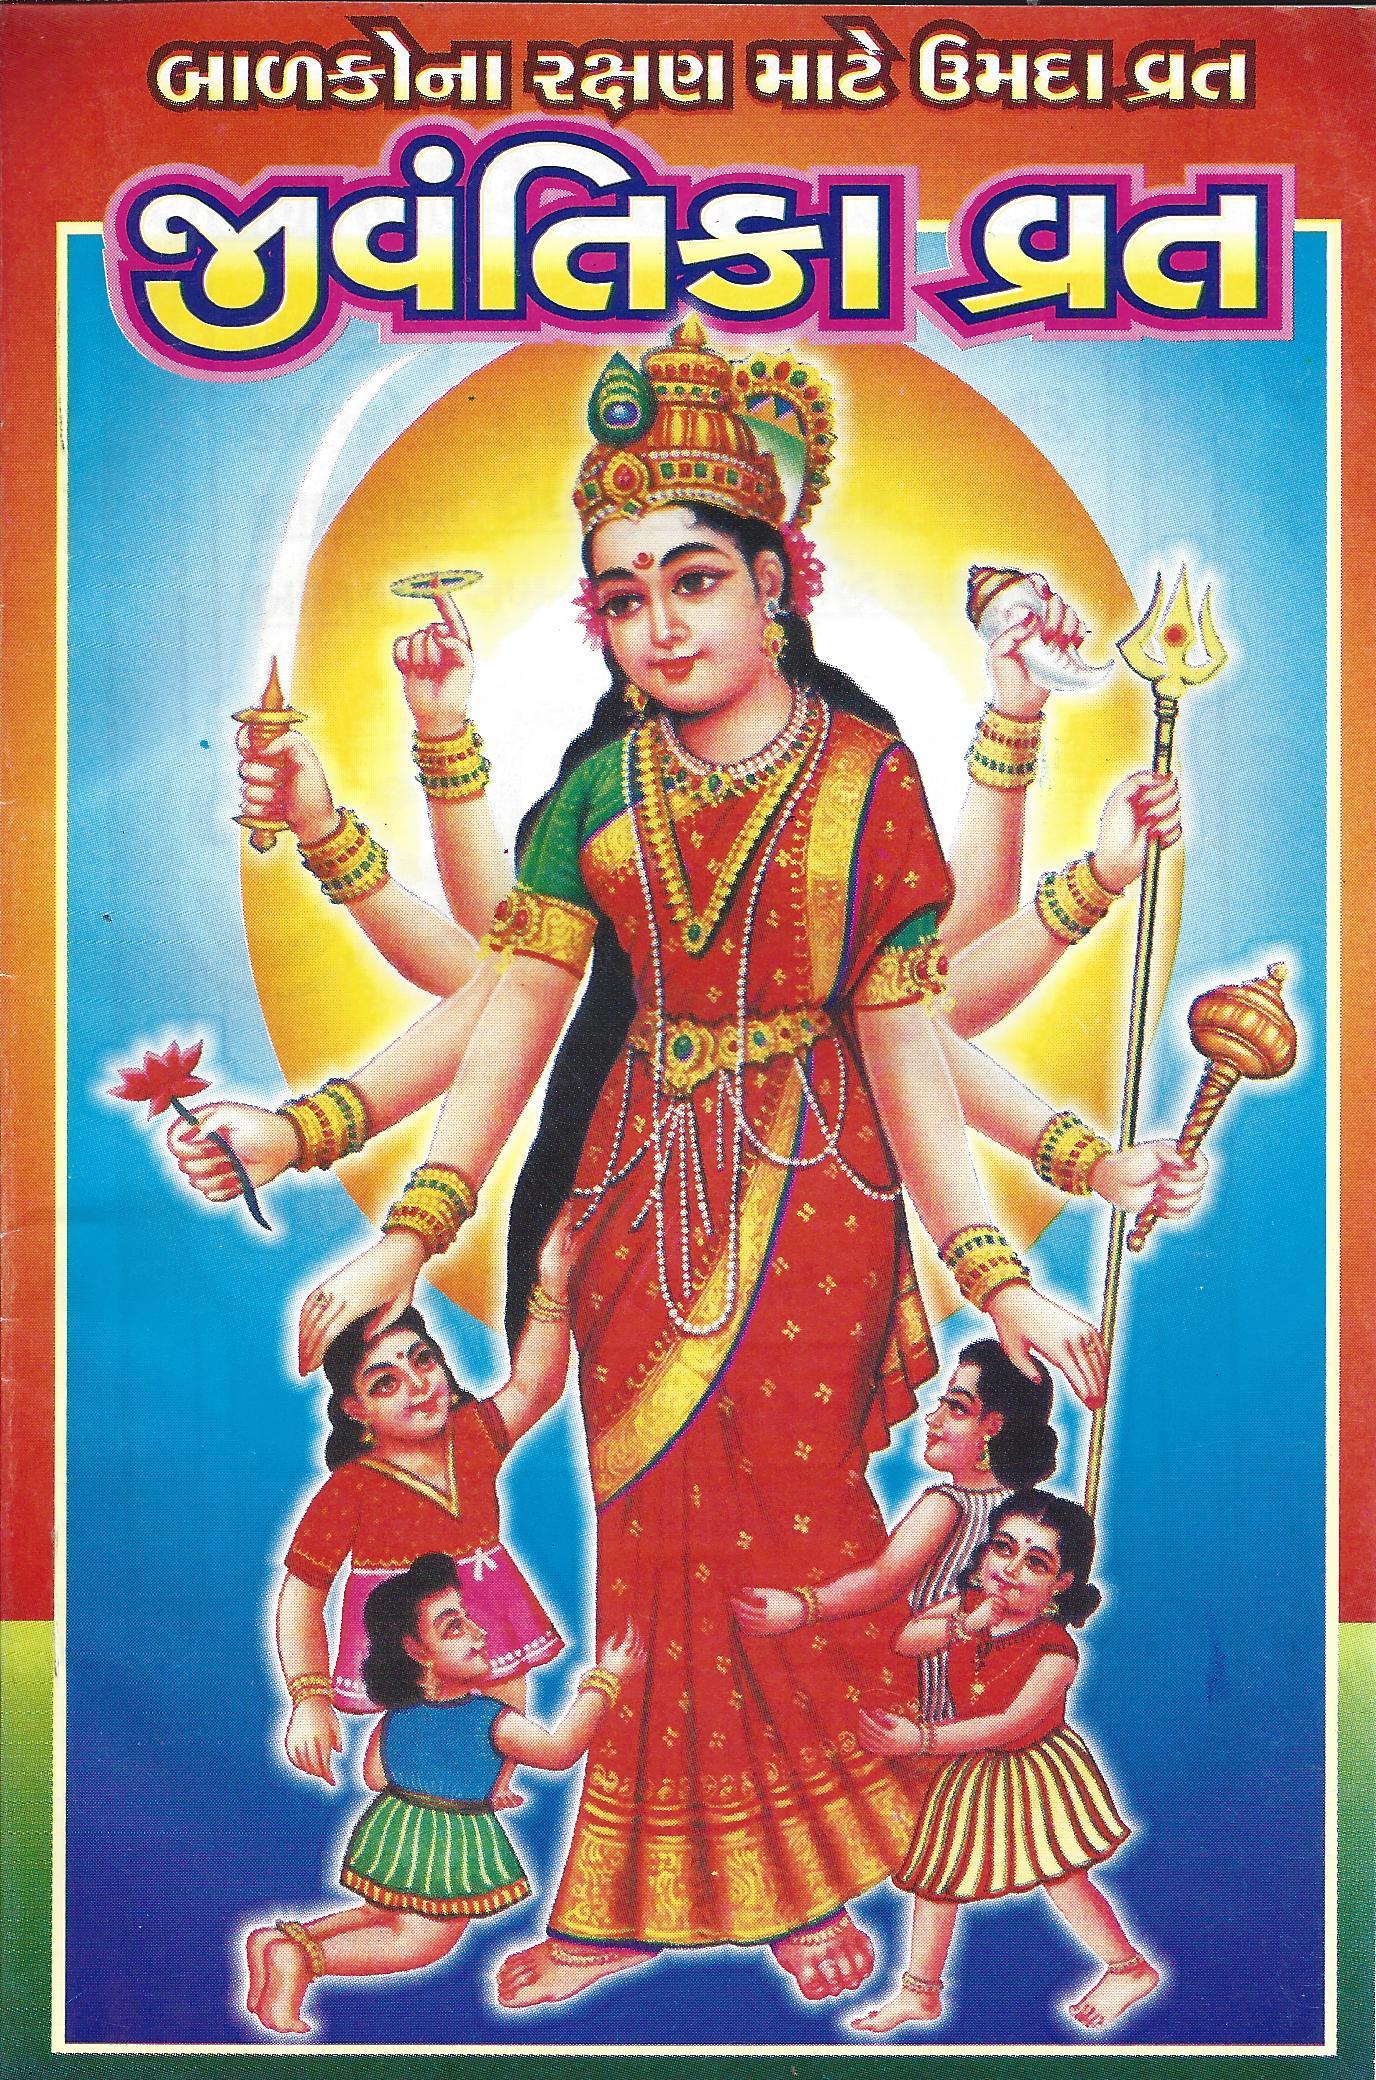 Jivantika Vrat Gujarati Uk Popat Stores